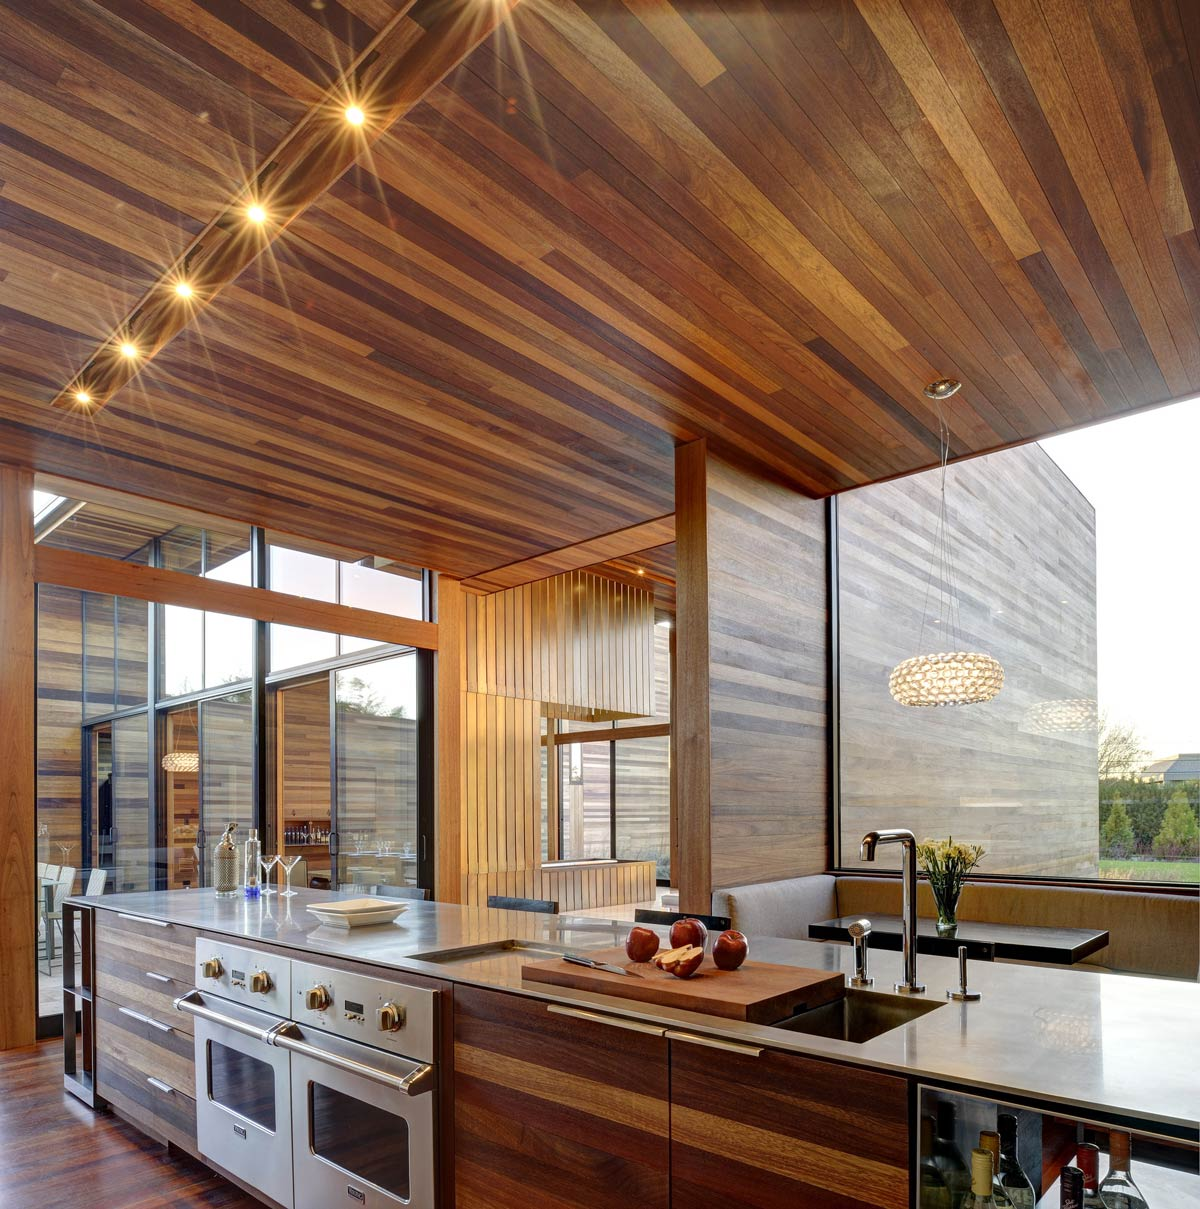 Wooden Kitchen Island, Sam's Creek in Bridgehampton, New York by Bates Masi Architects